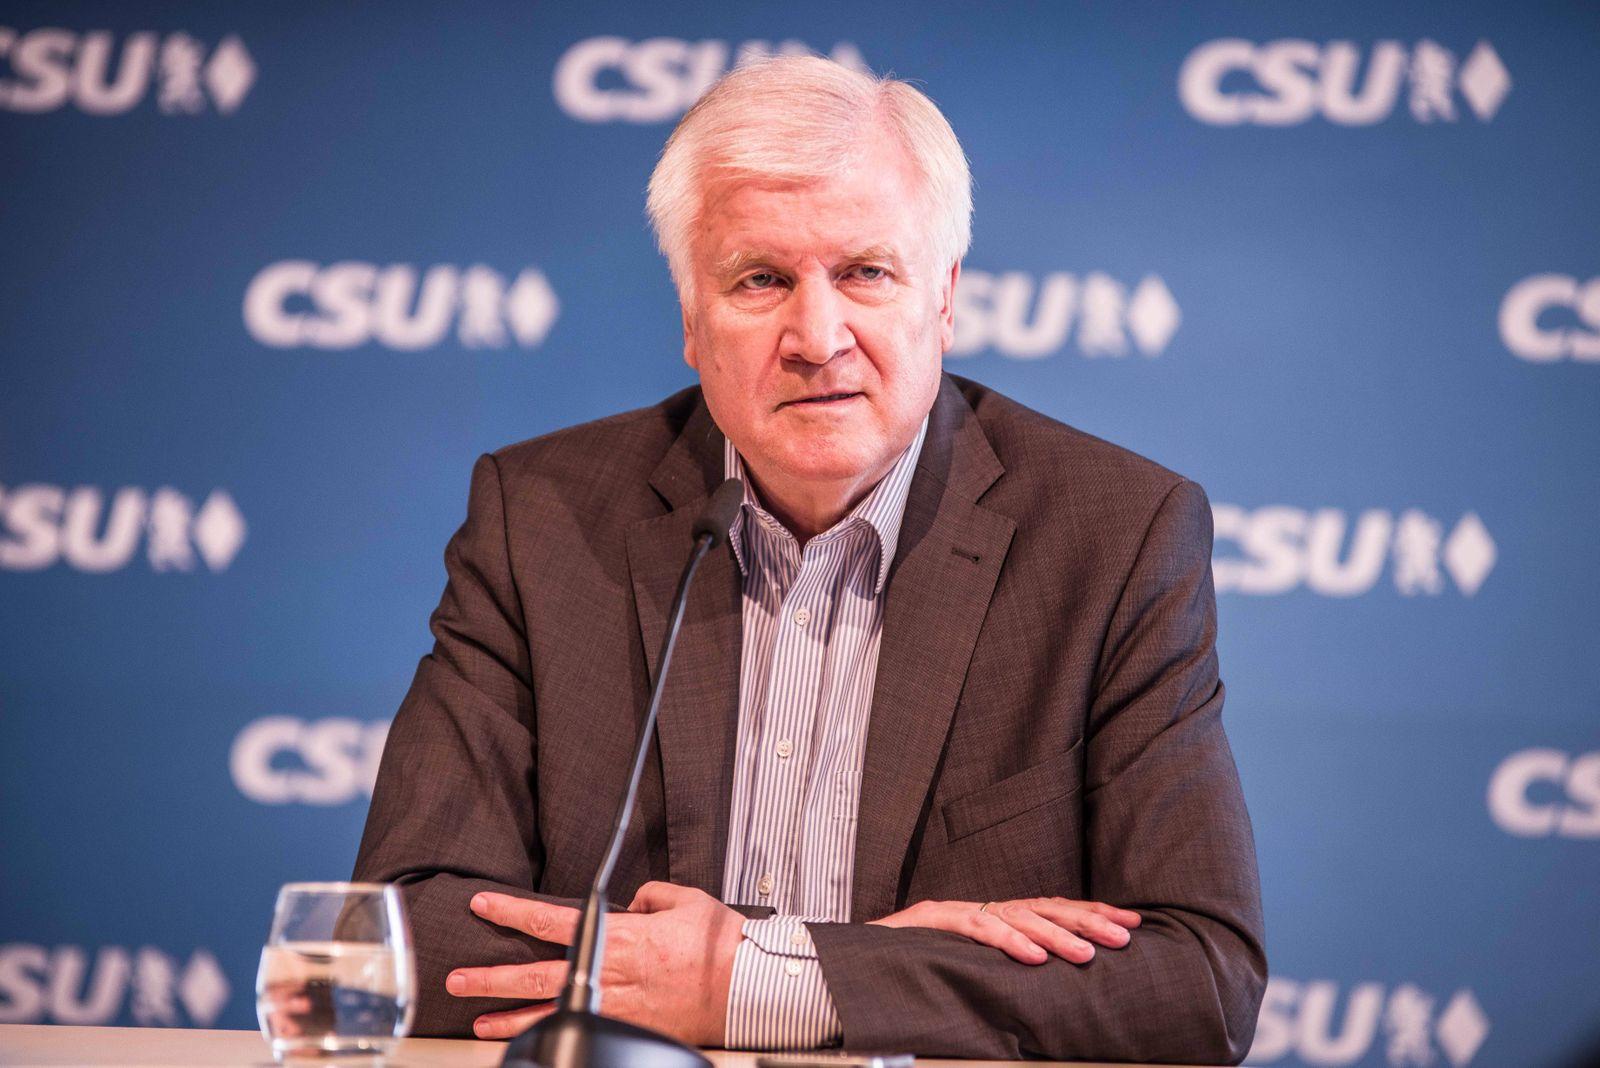 June 18 2018 Munich Bavaria Germany German Interior Minister and head of the Bavarian CSU par